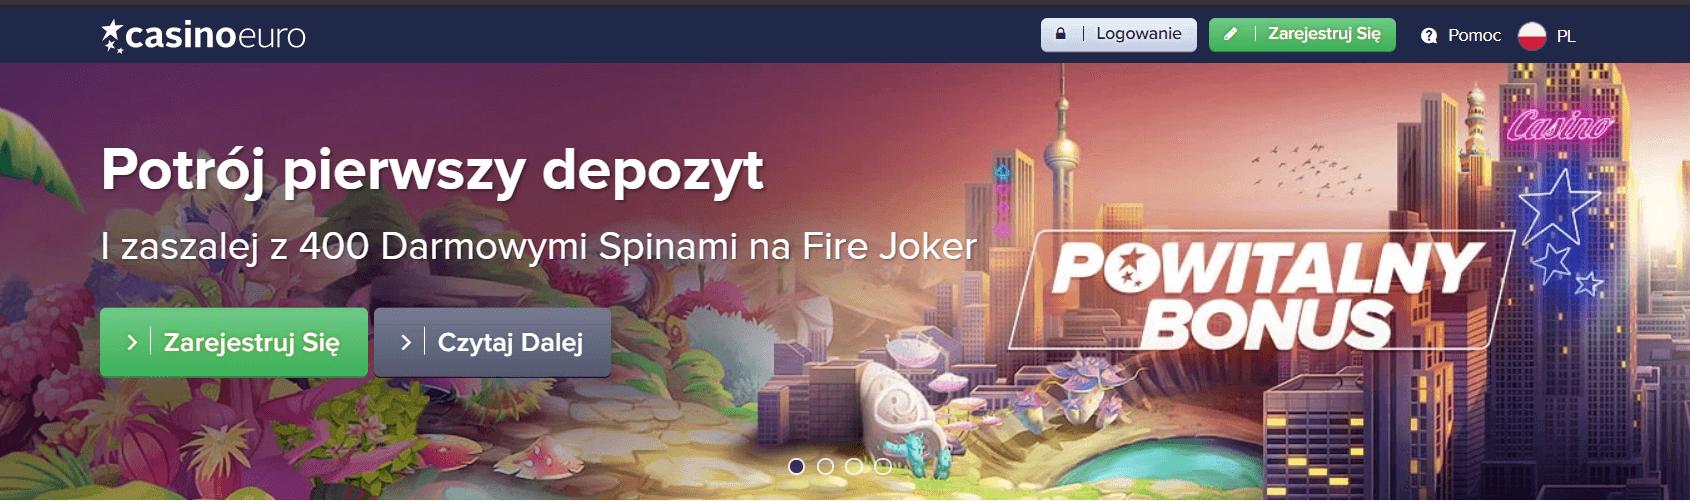 casinoeuro bonus powitalny screenshot